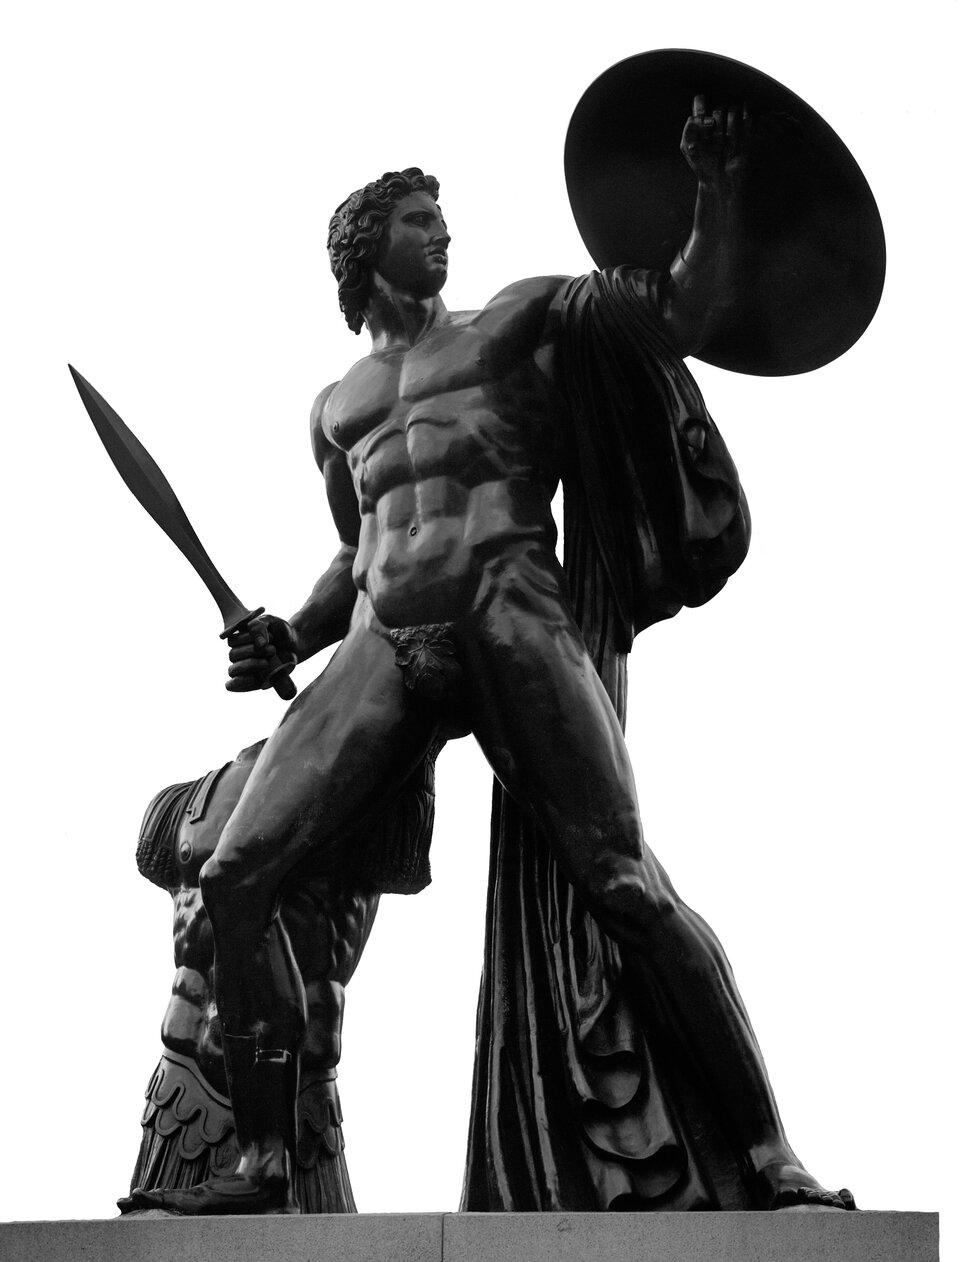 Posąg Achillesa Posąg Achillesa Źródło: Anthony Hevron, Hyde Park, Londyn, licencja: CC BY 2.0.